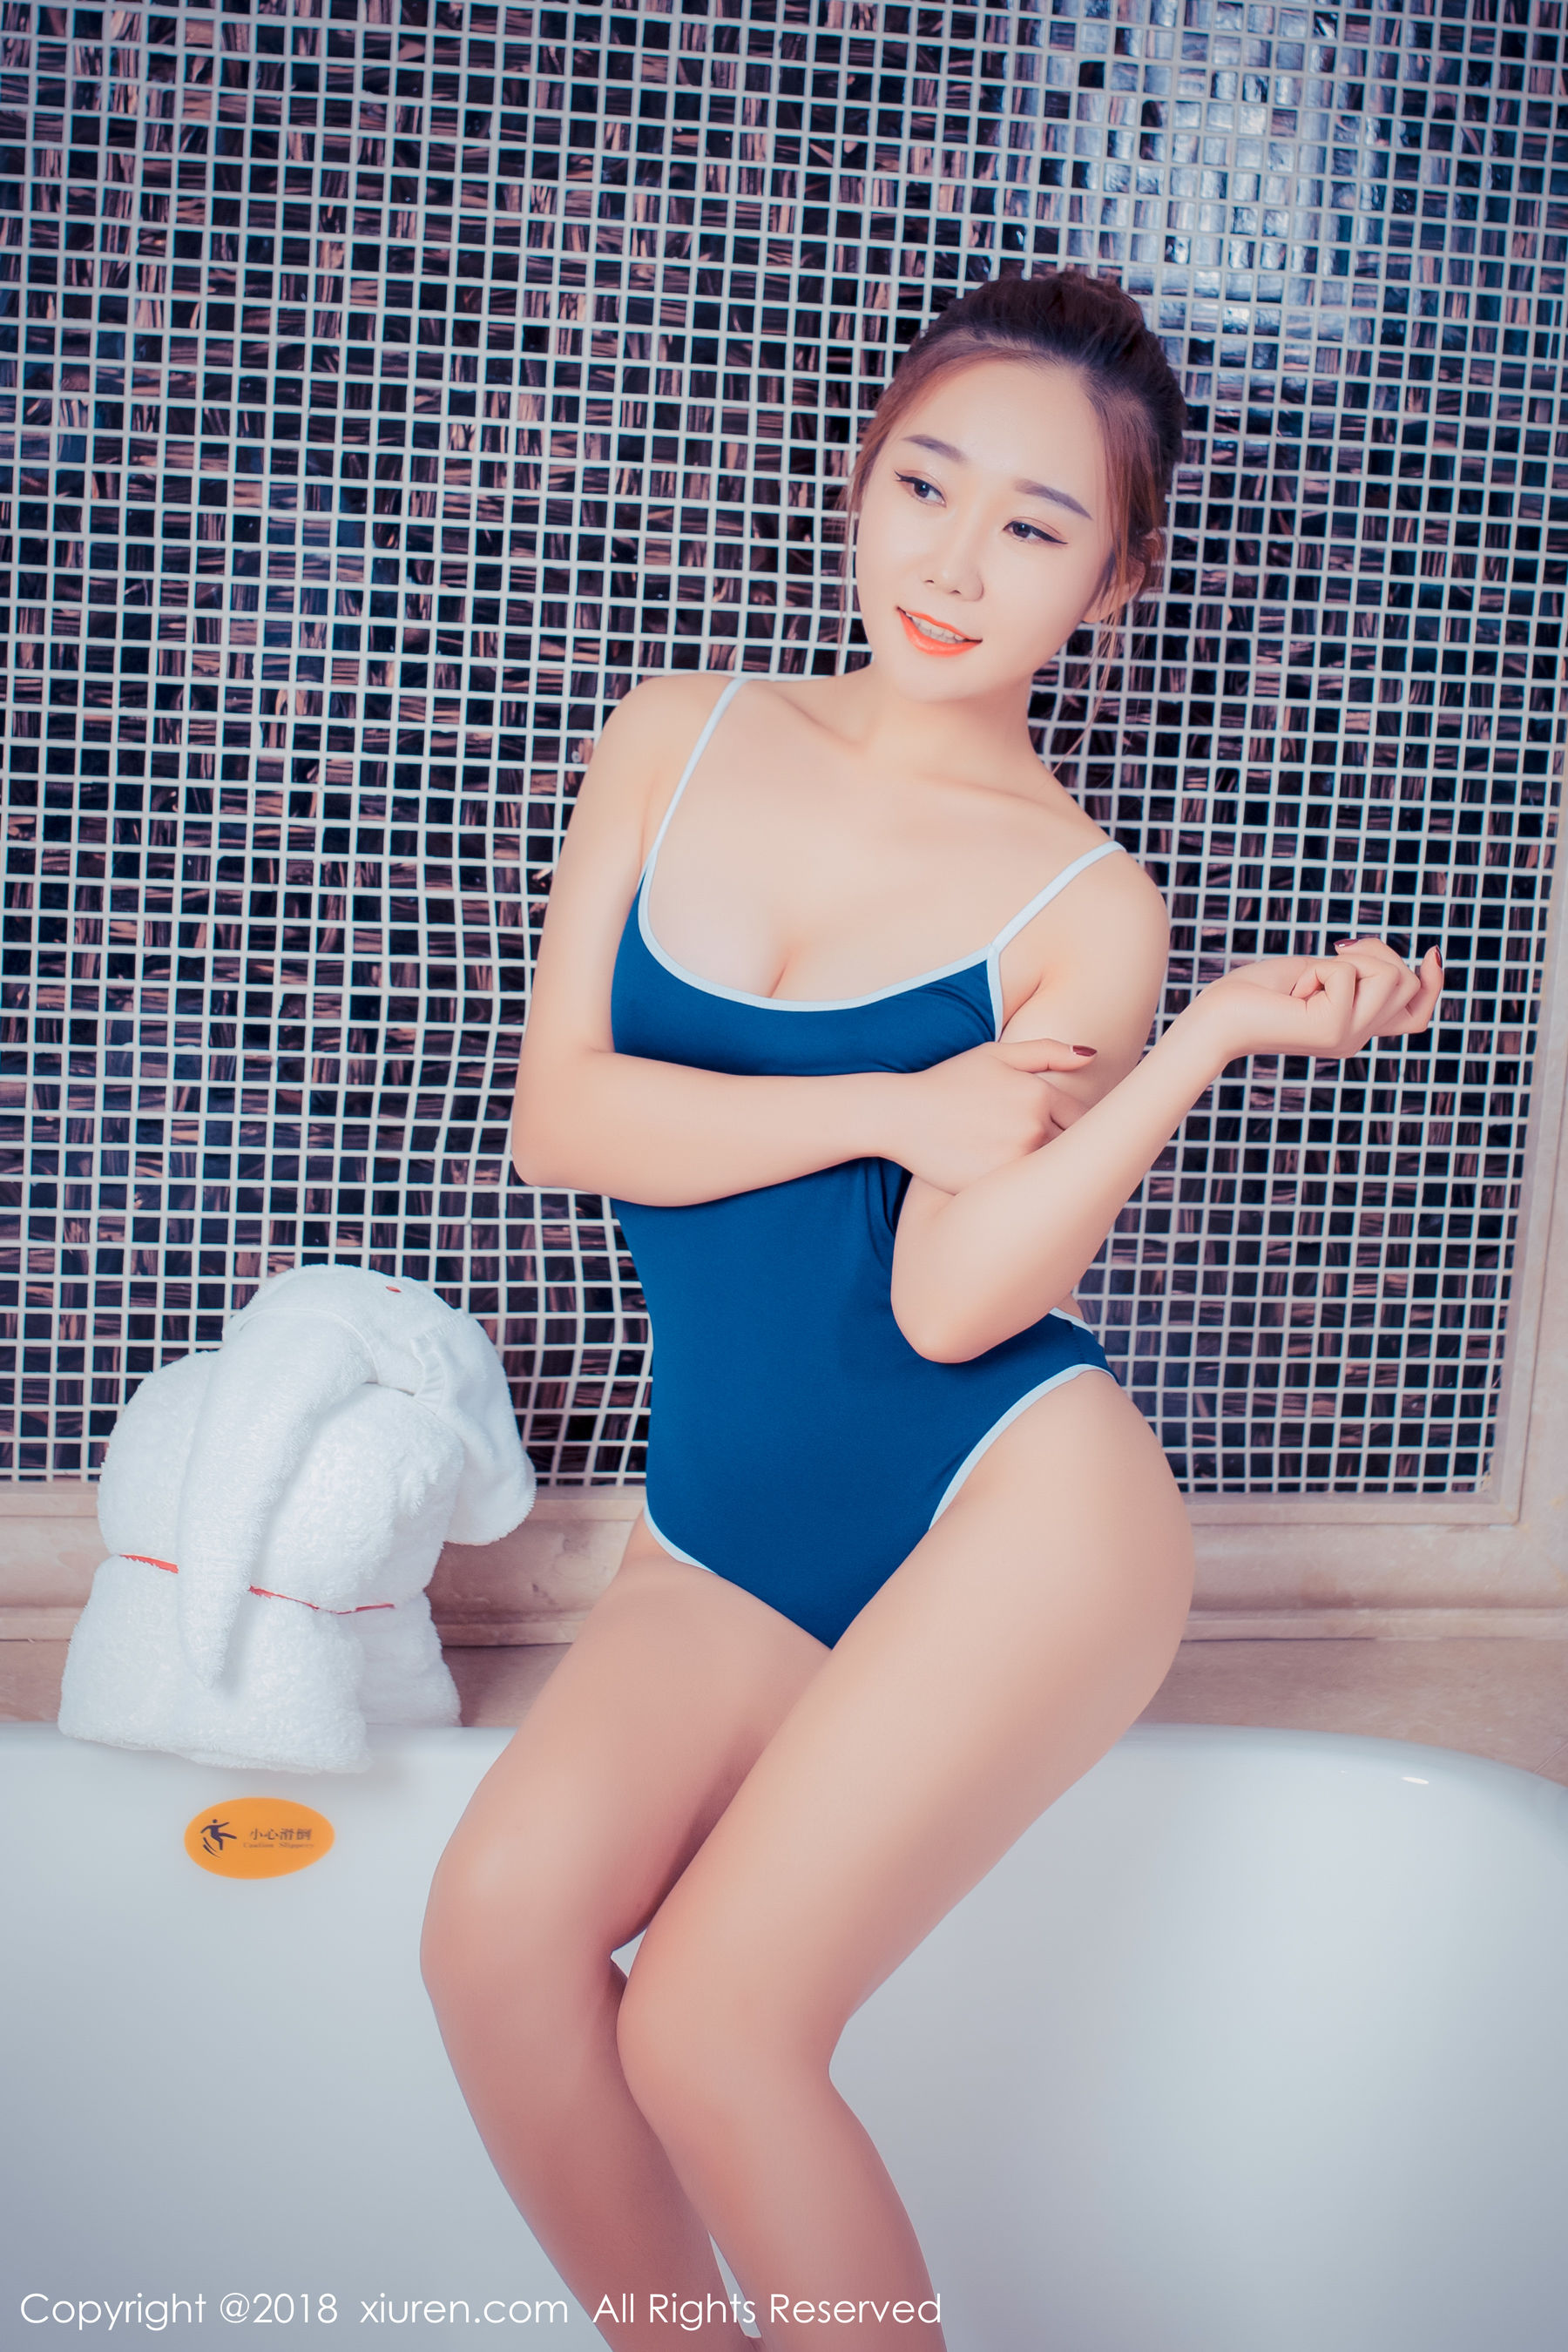 VOL.156 [秀人网]大胆人体艺术浴室美乳:棉花糖candy(模特棉花糖)超高清写真套图(58P)